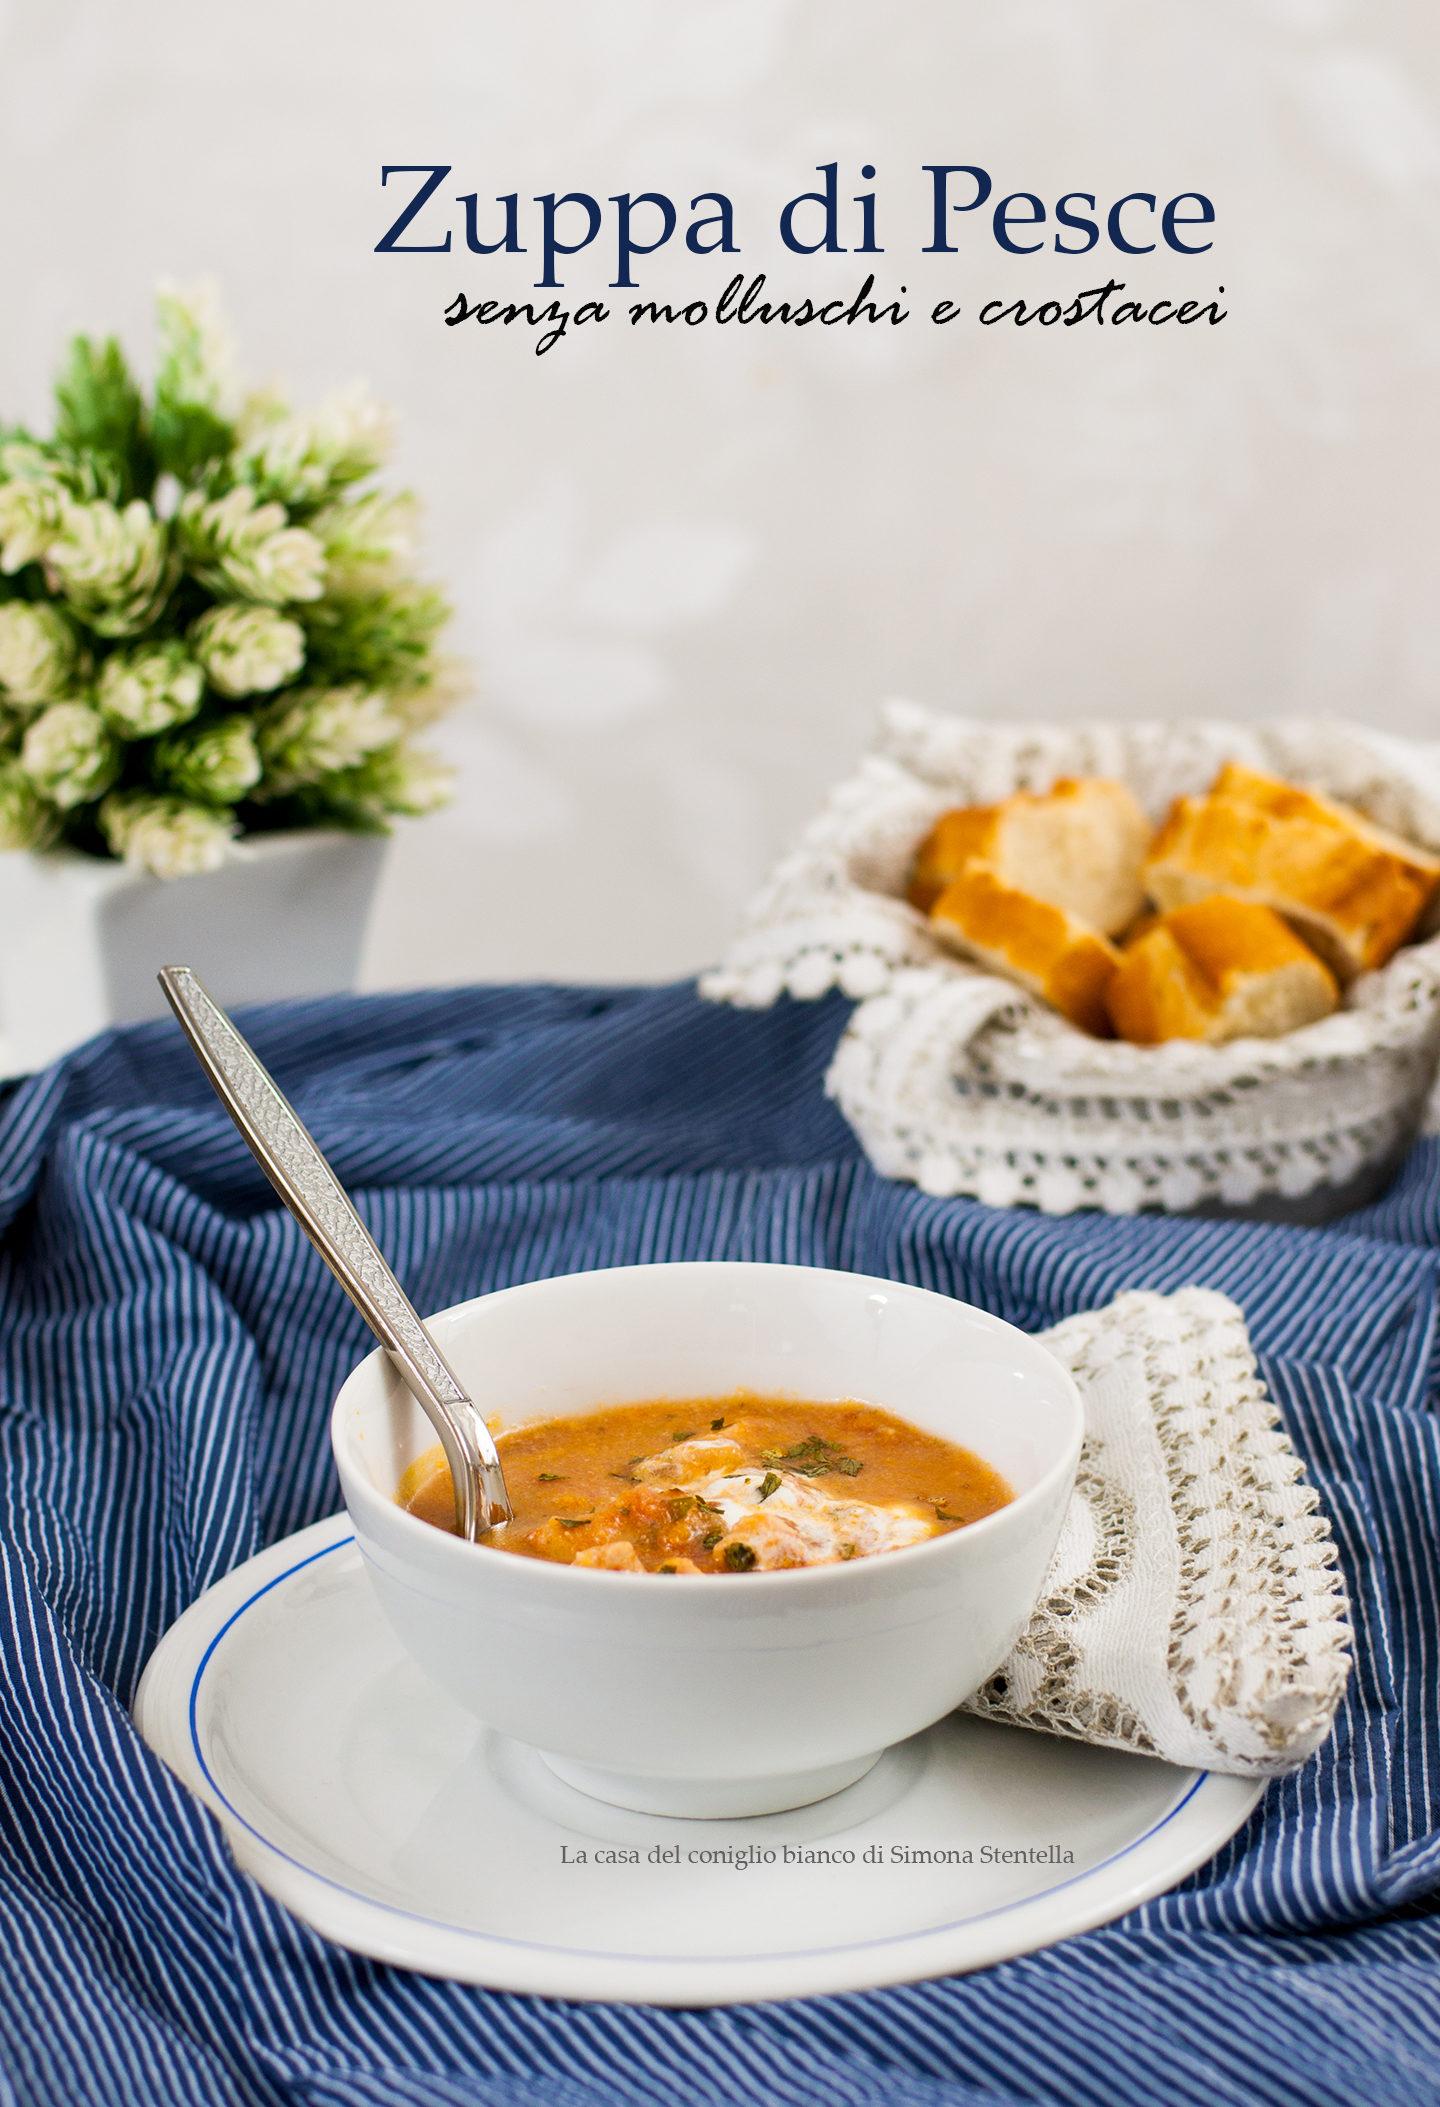 Zuppa di pesce senza molluschi e crostacei